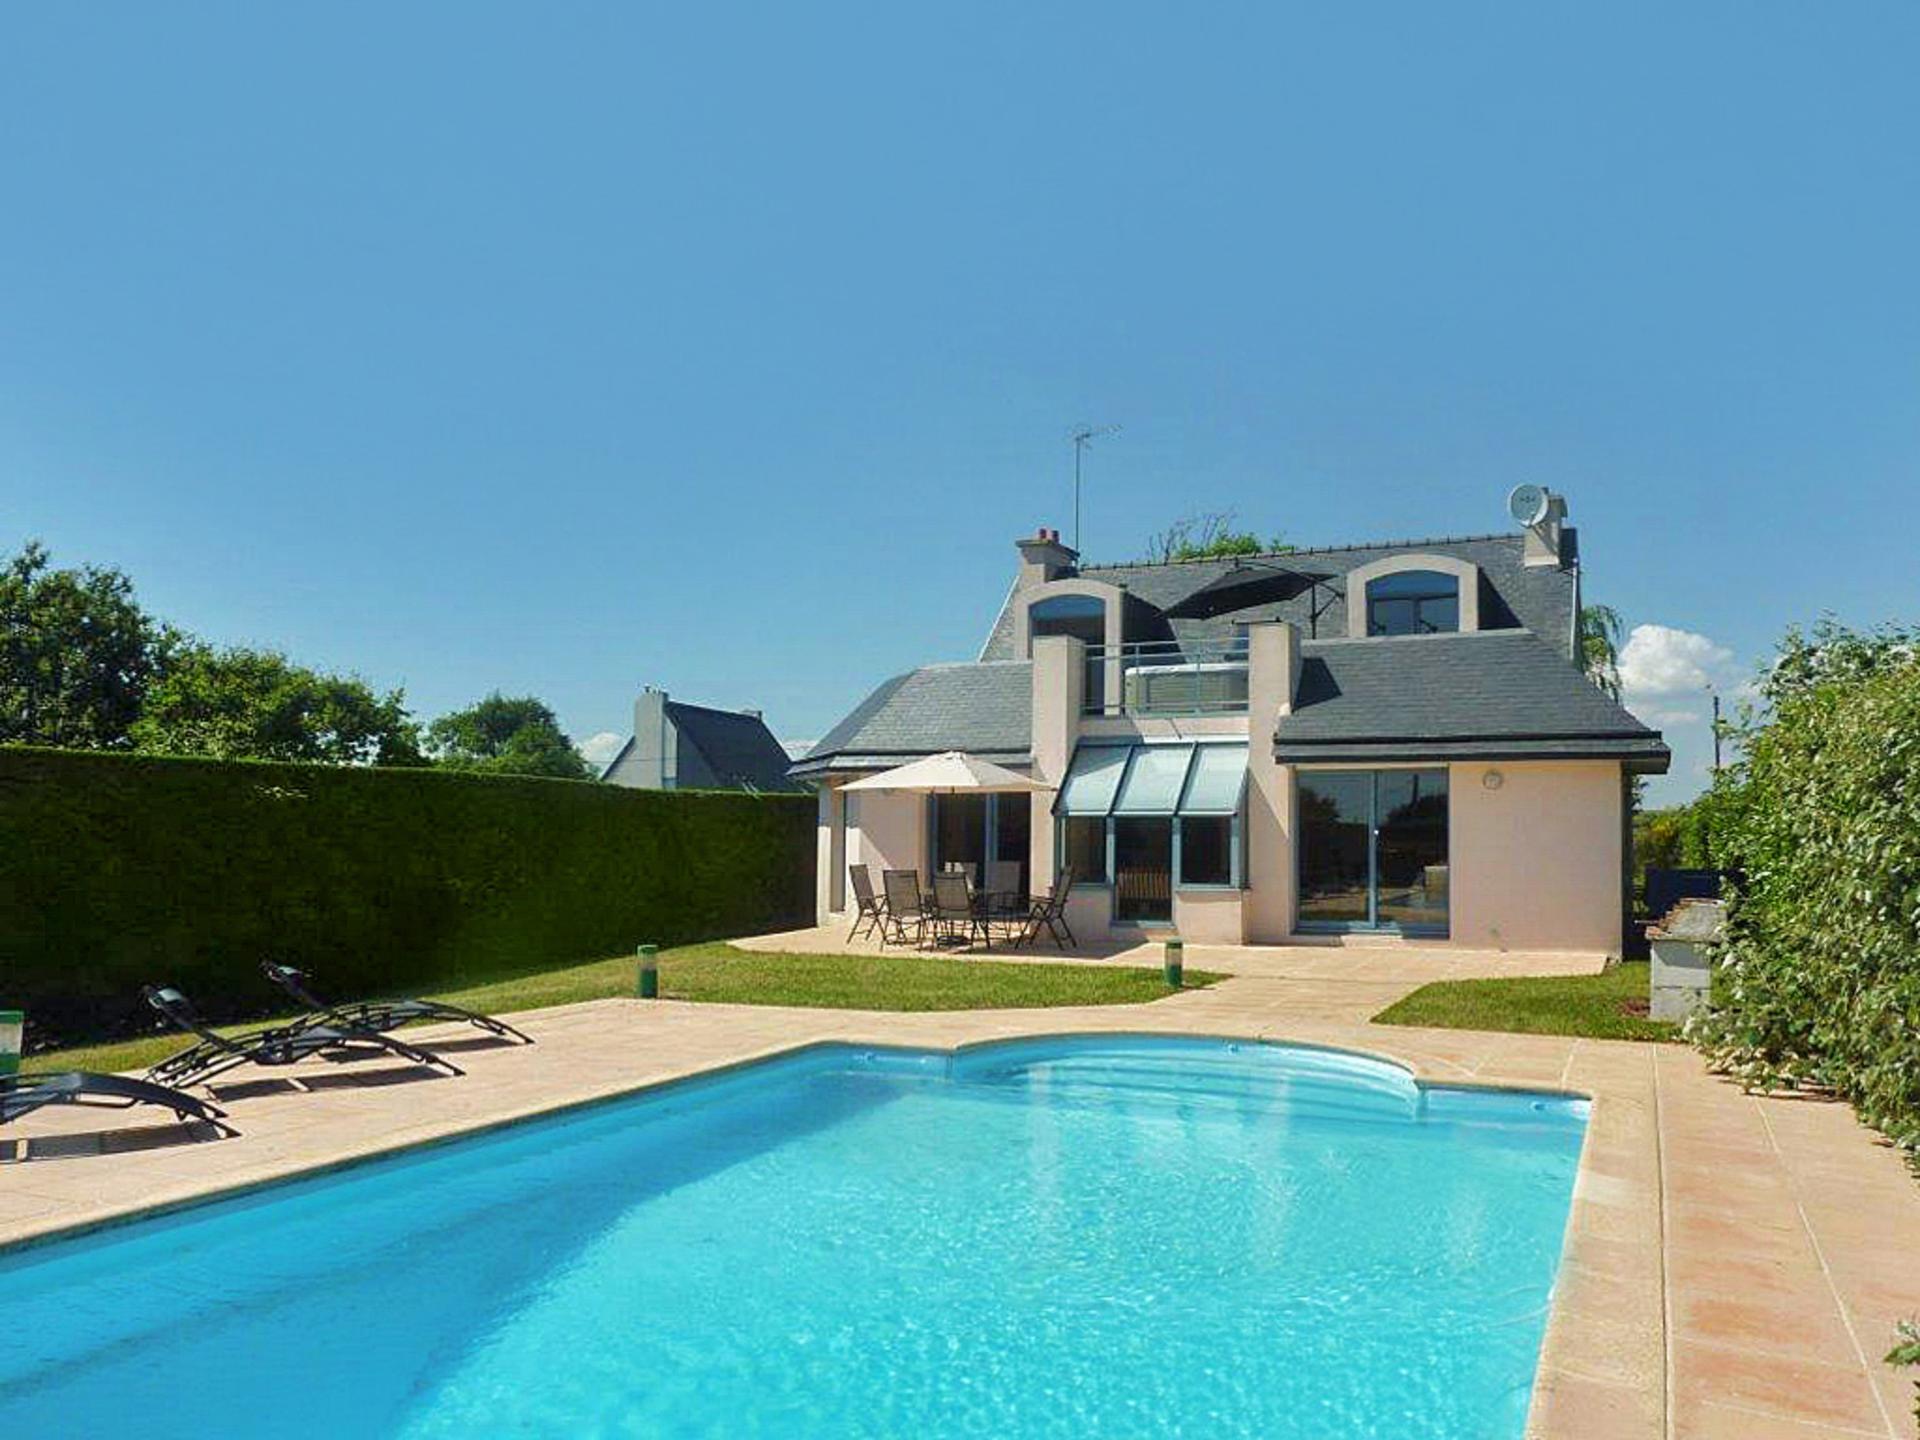 Doelan-sur-Mer villa with pool and seaviews